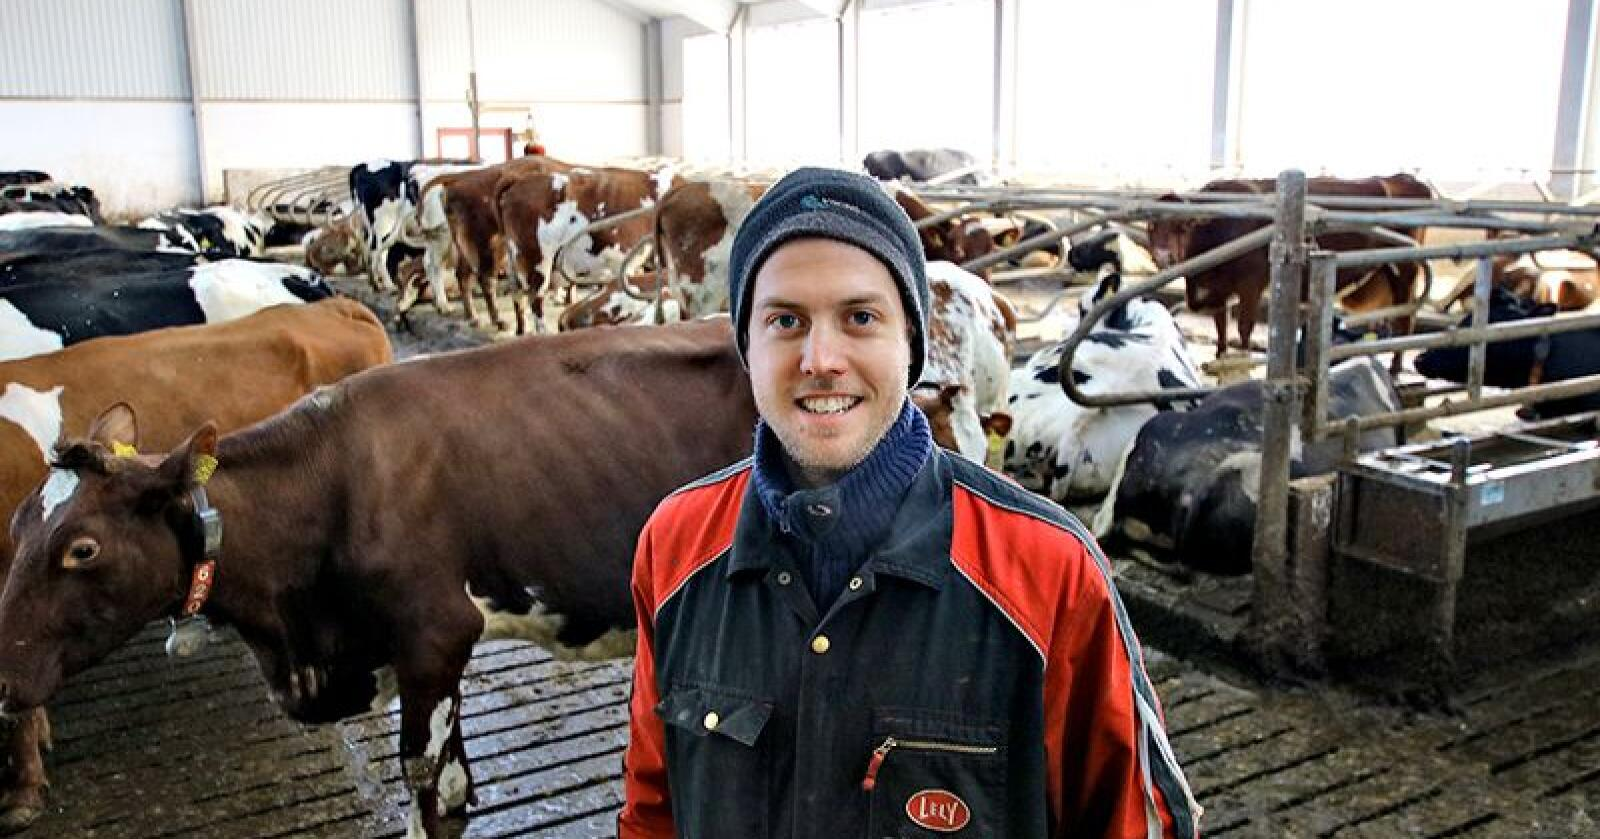 Ny leder: Knut Johan Singstad ble valgt til ny leder i Norsk Holstein i helga. Han overtok en rein NRF-besetning i 2009, men får stadig flere svarte og hvite kyr i fjøset. Foto: Camilla Mellemstrand